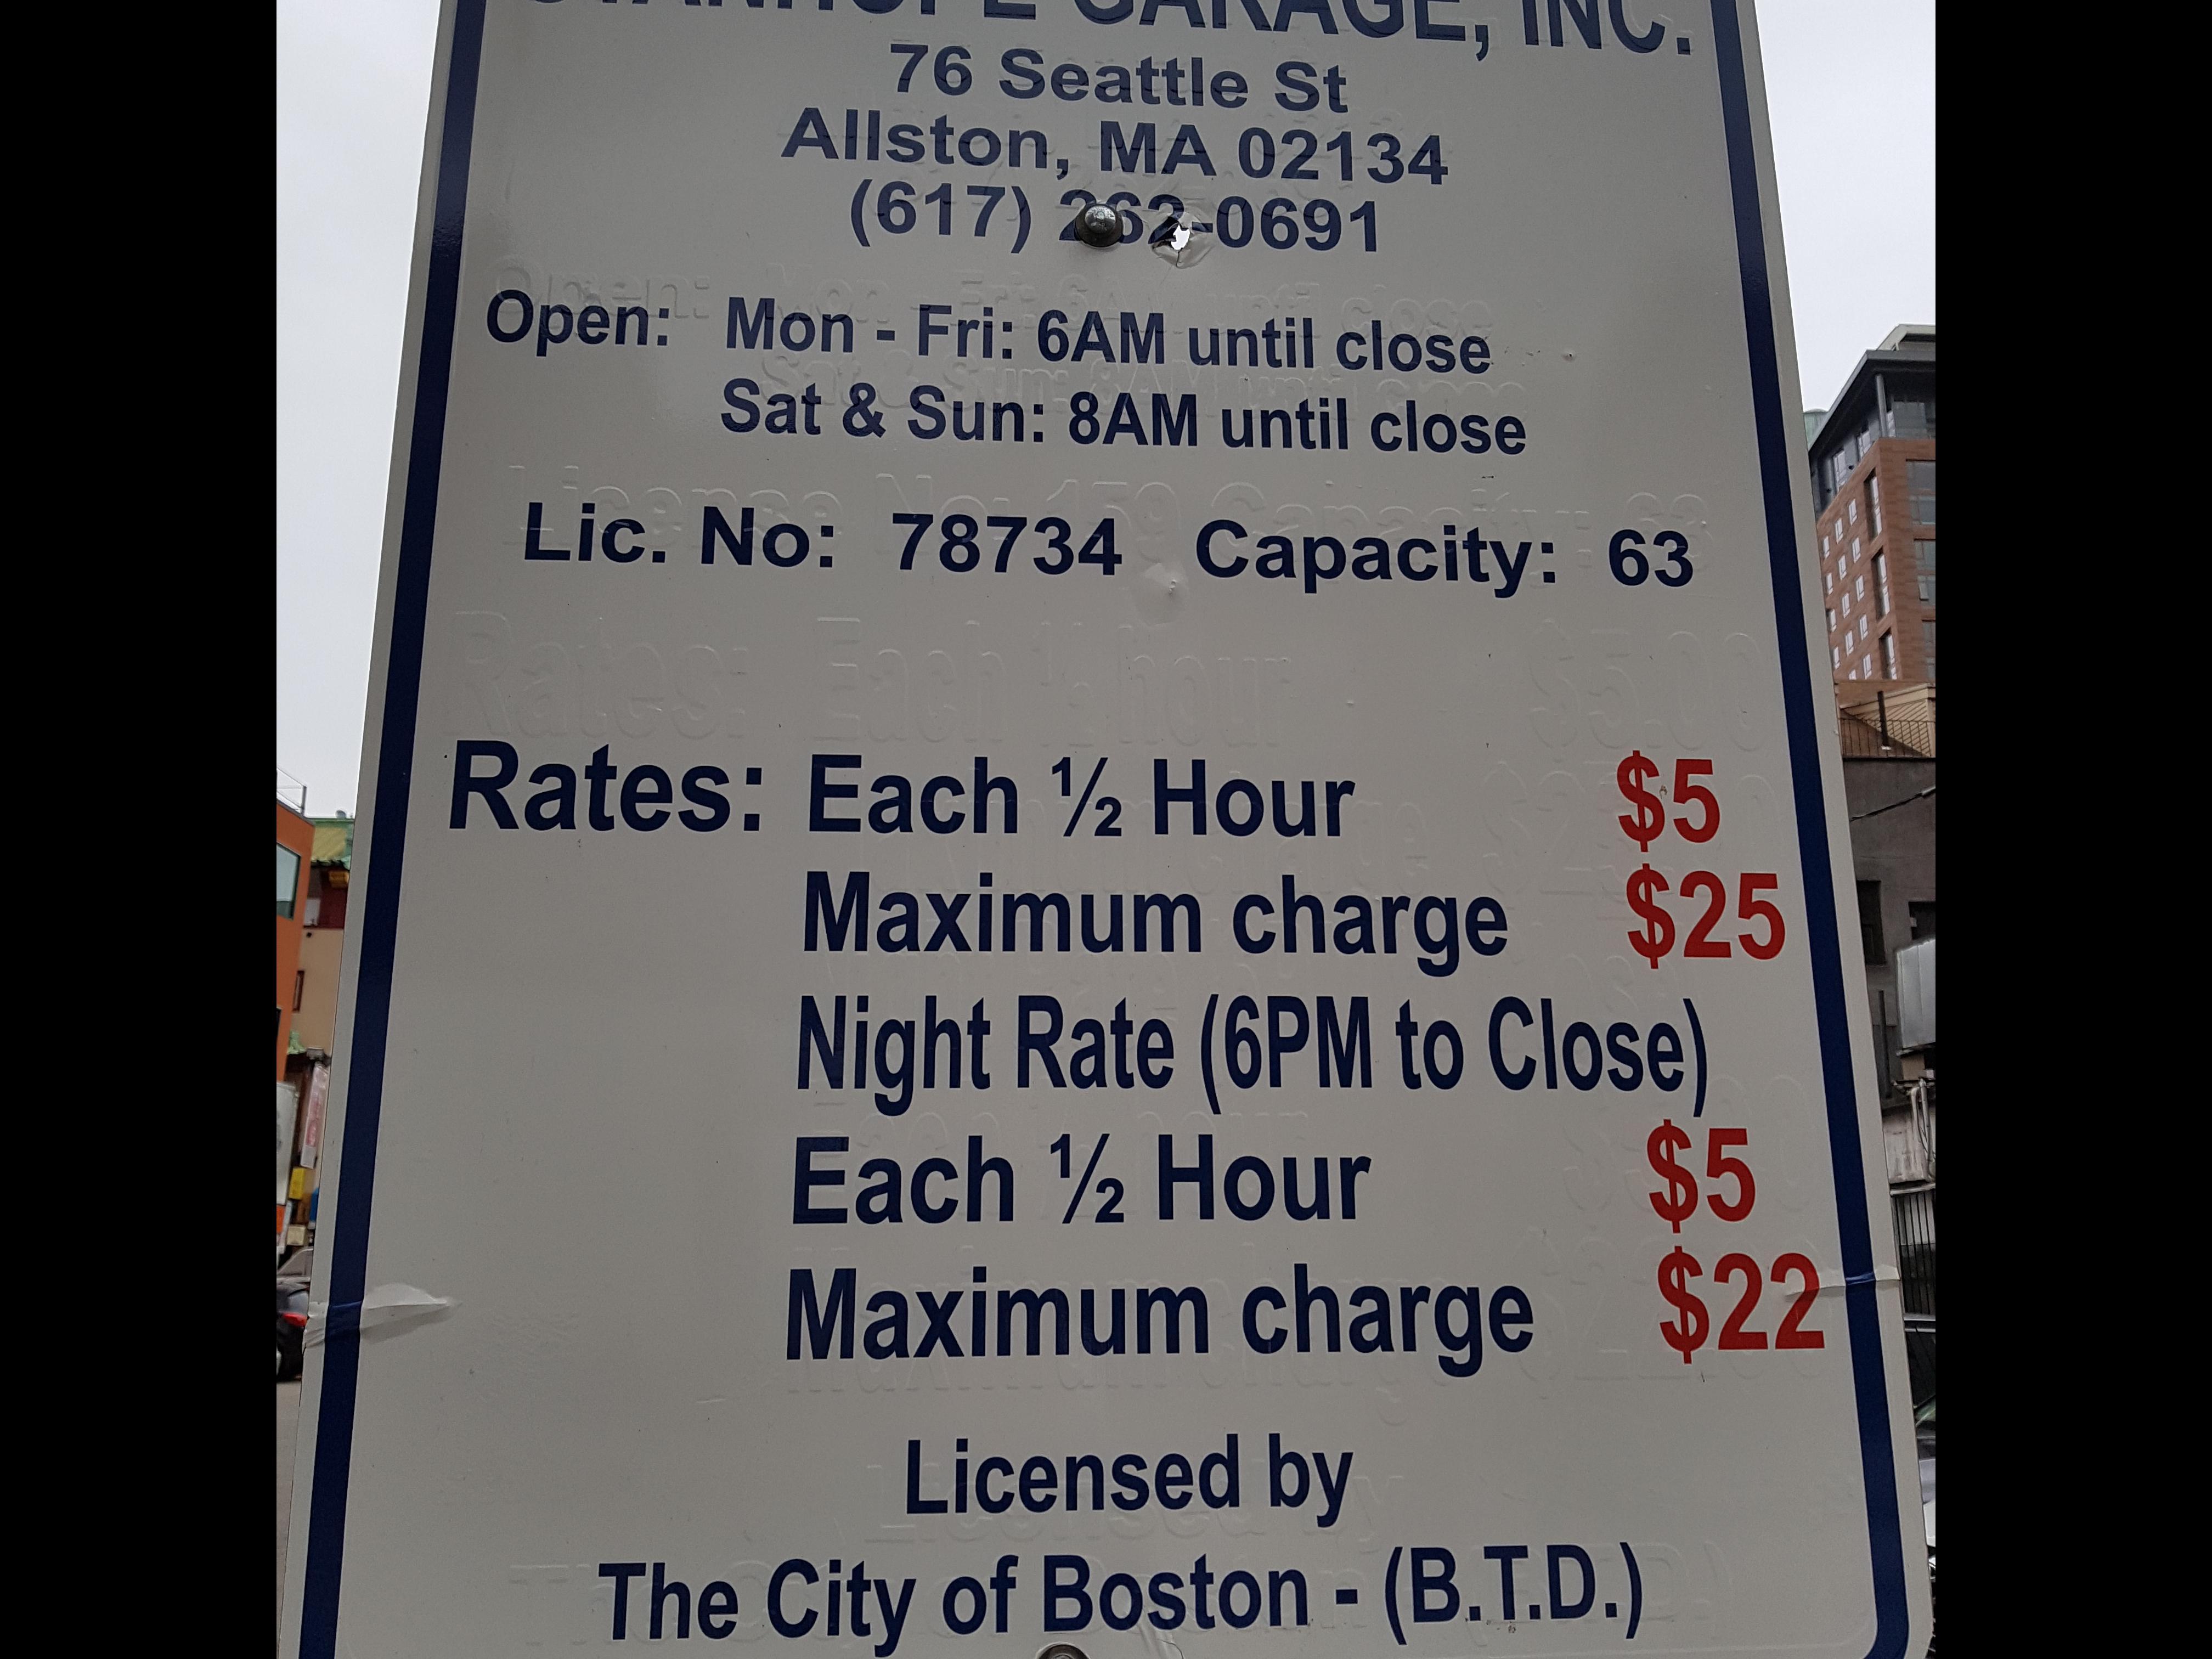 84 Harrison Ave Parking - Parking in Boston | ParkMe